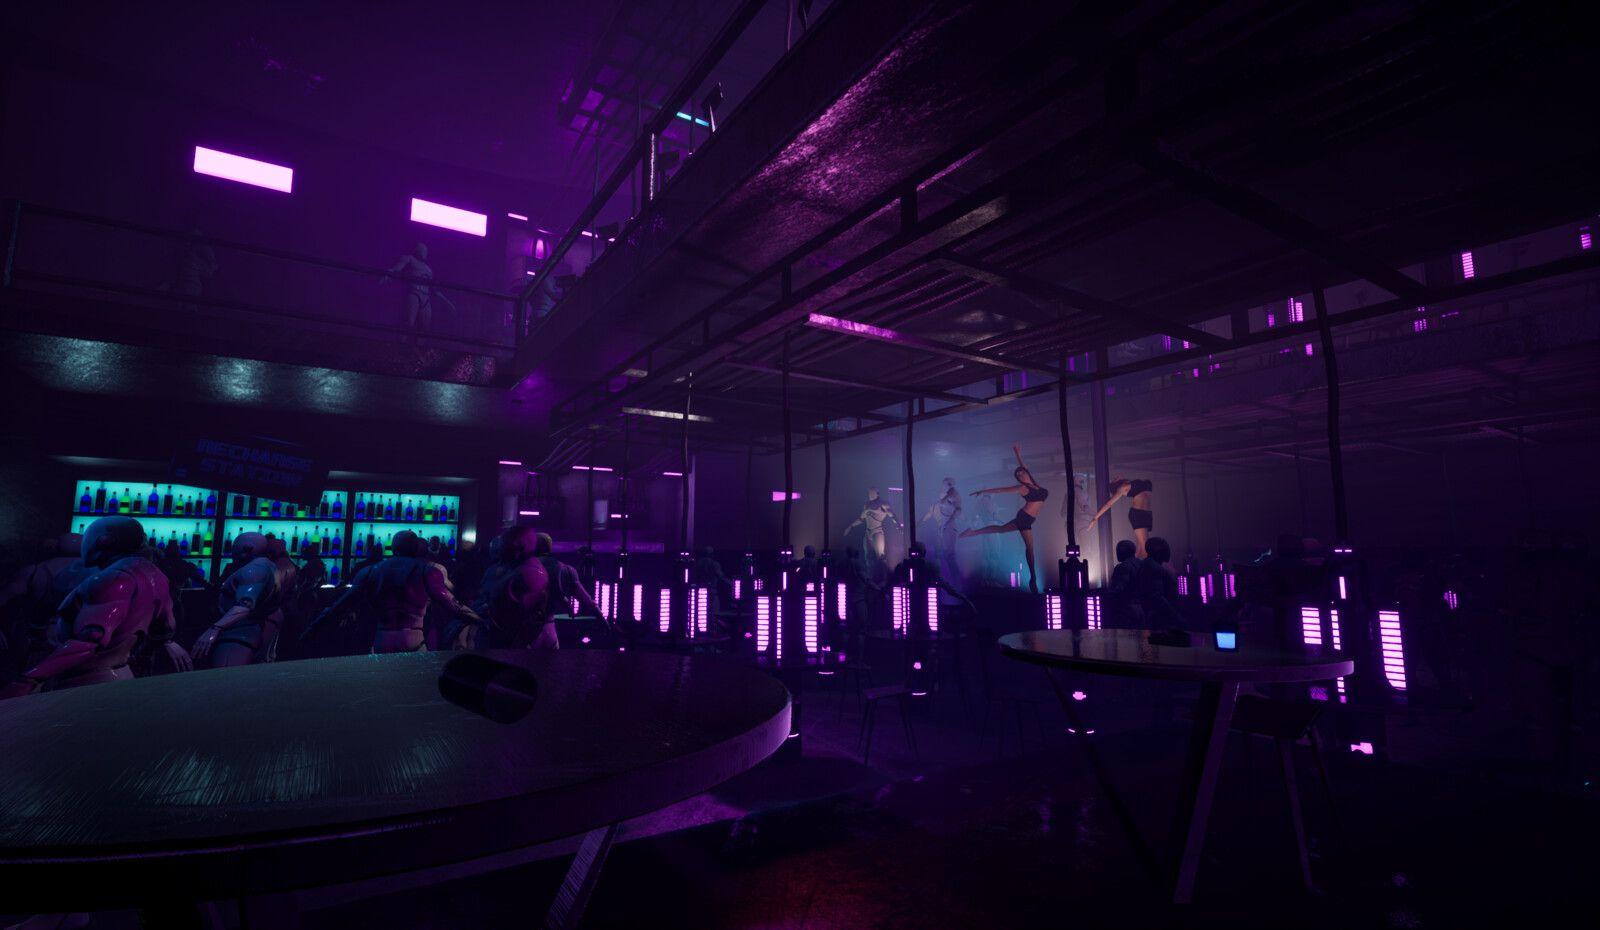 Ночной клуб cyberpunk адреналин клуб москва адрес